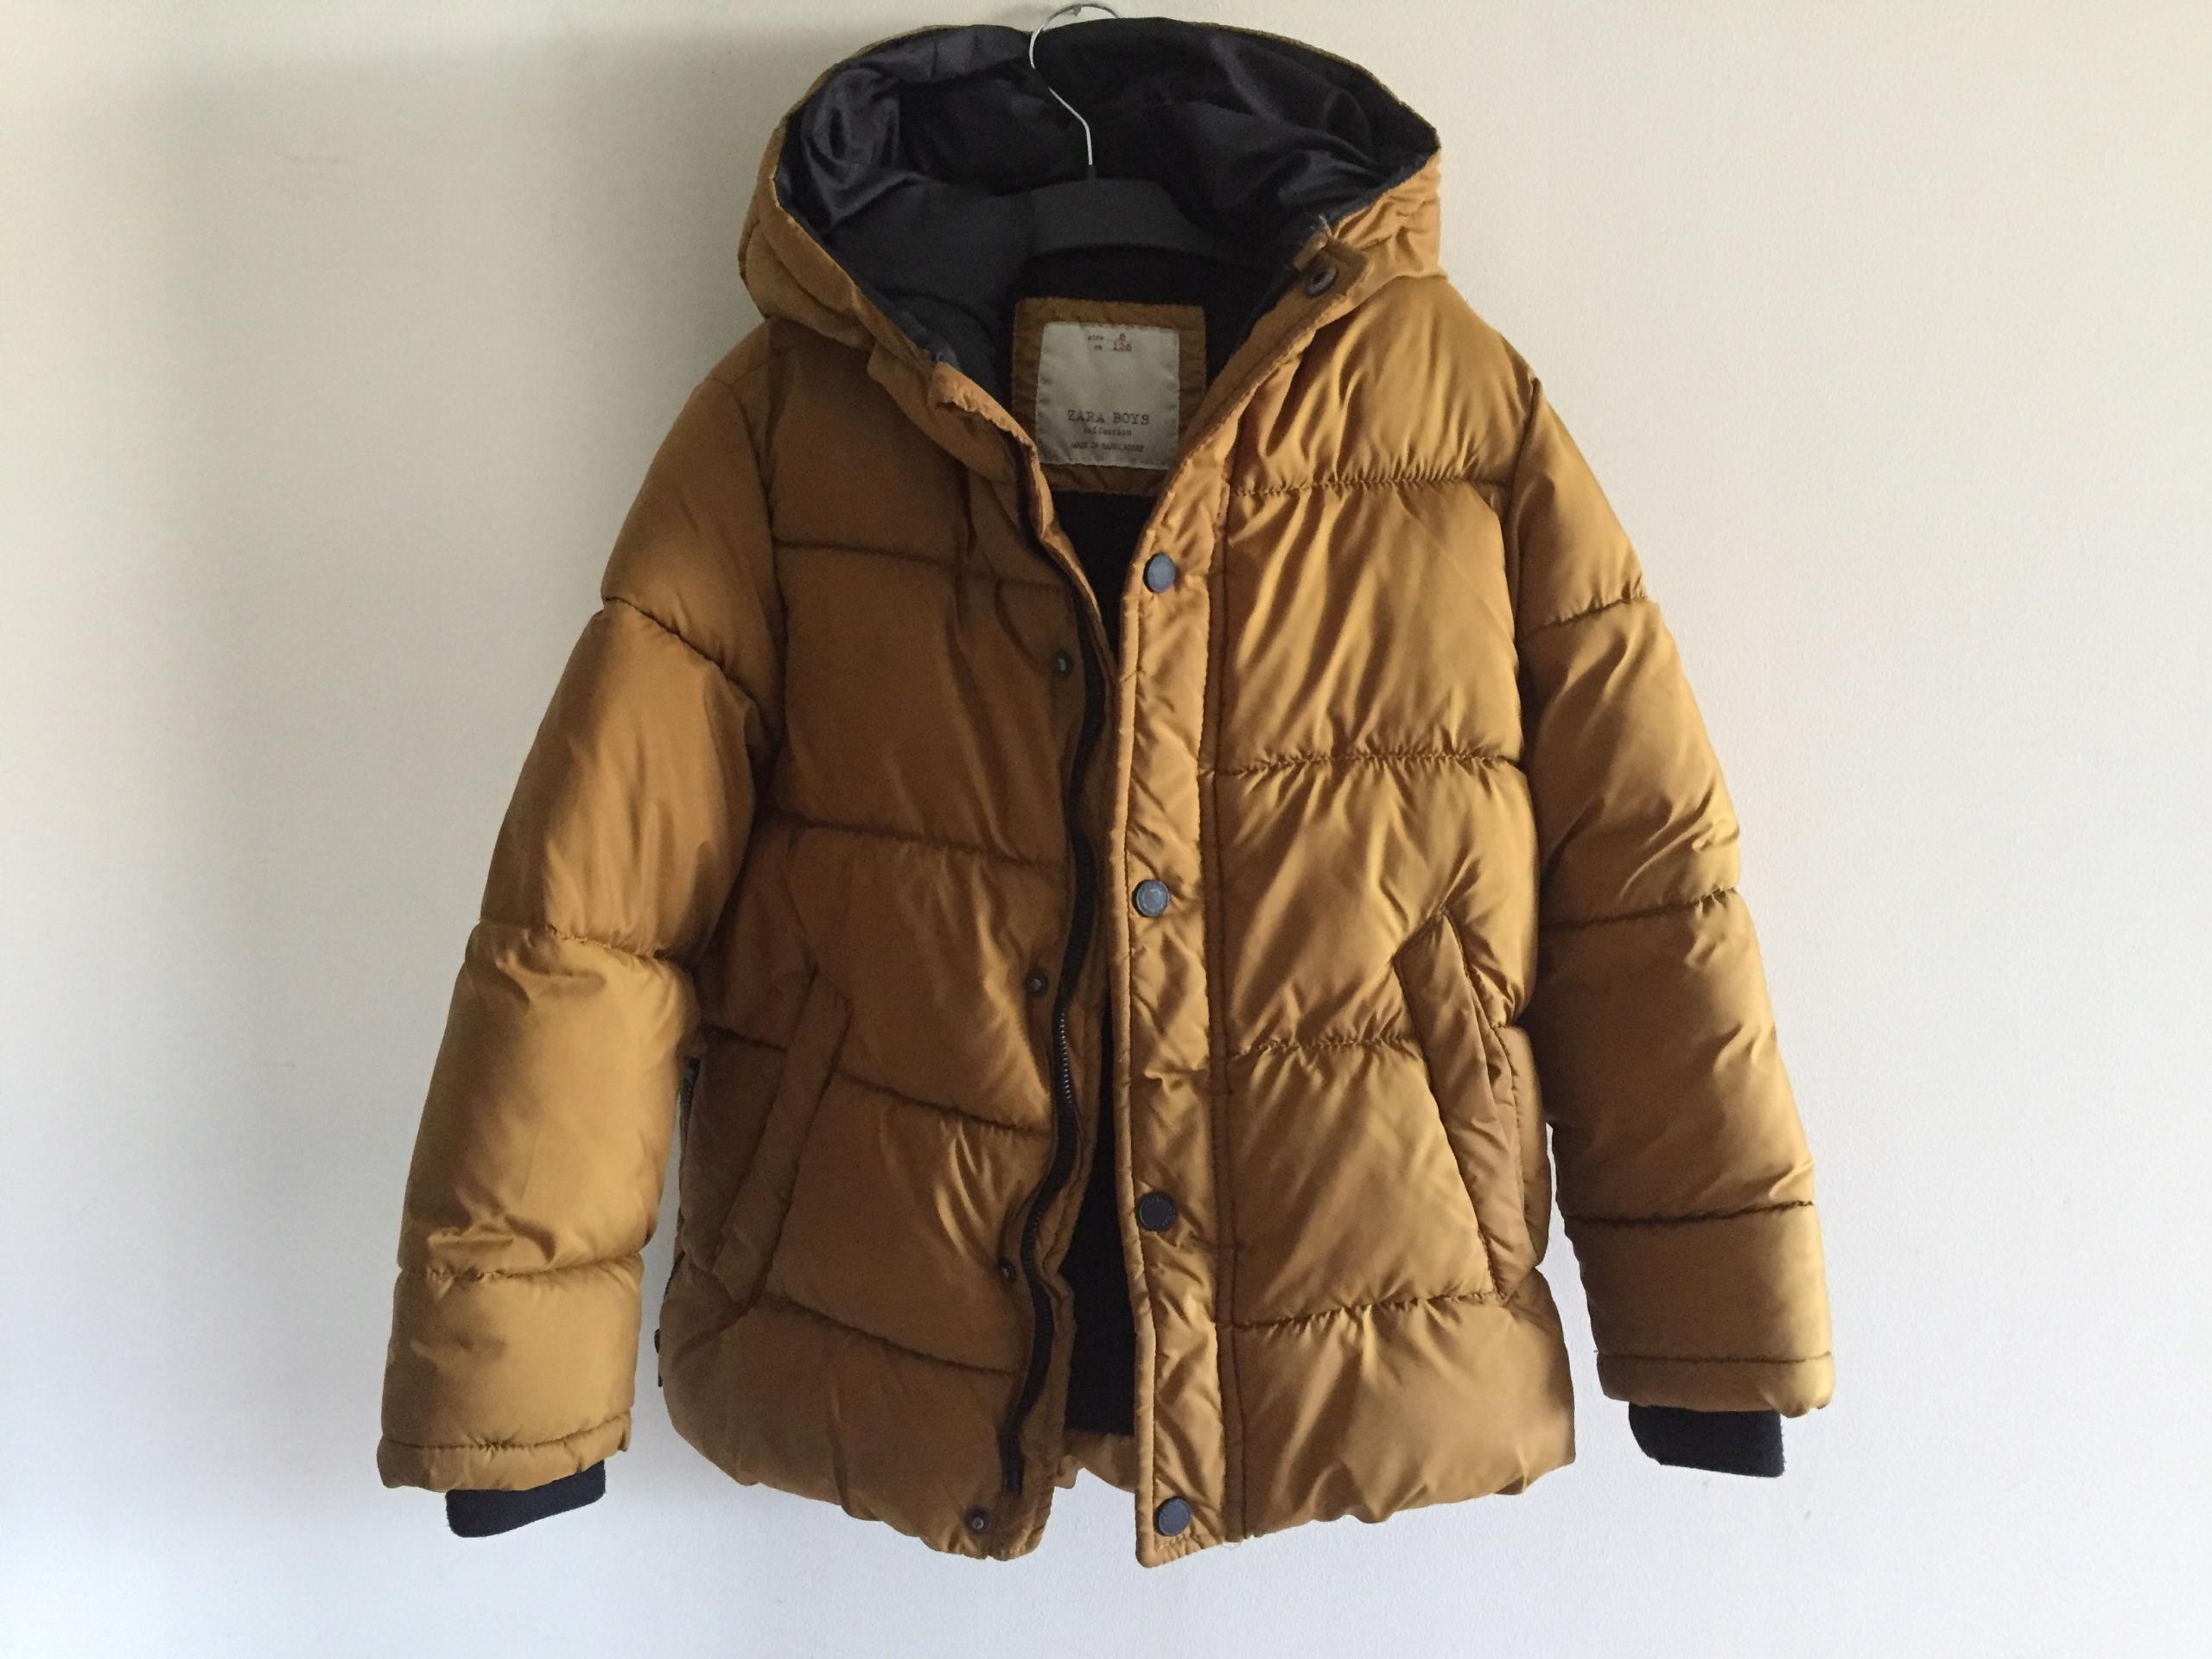 ZARA kurtka z kapturem polar rozm 116 128